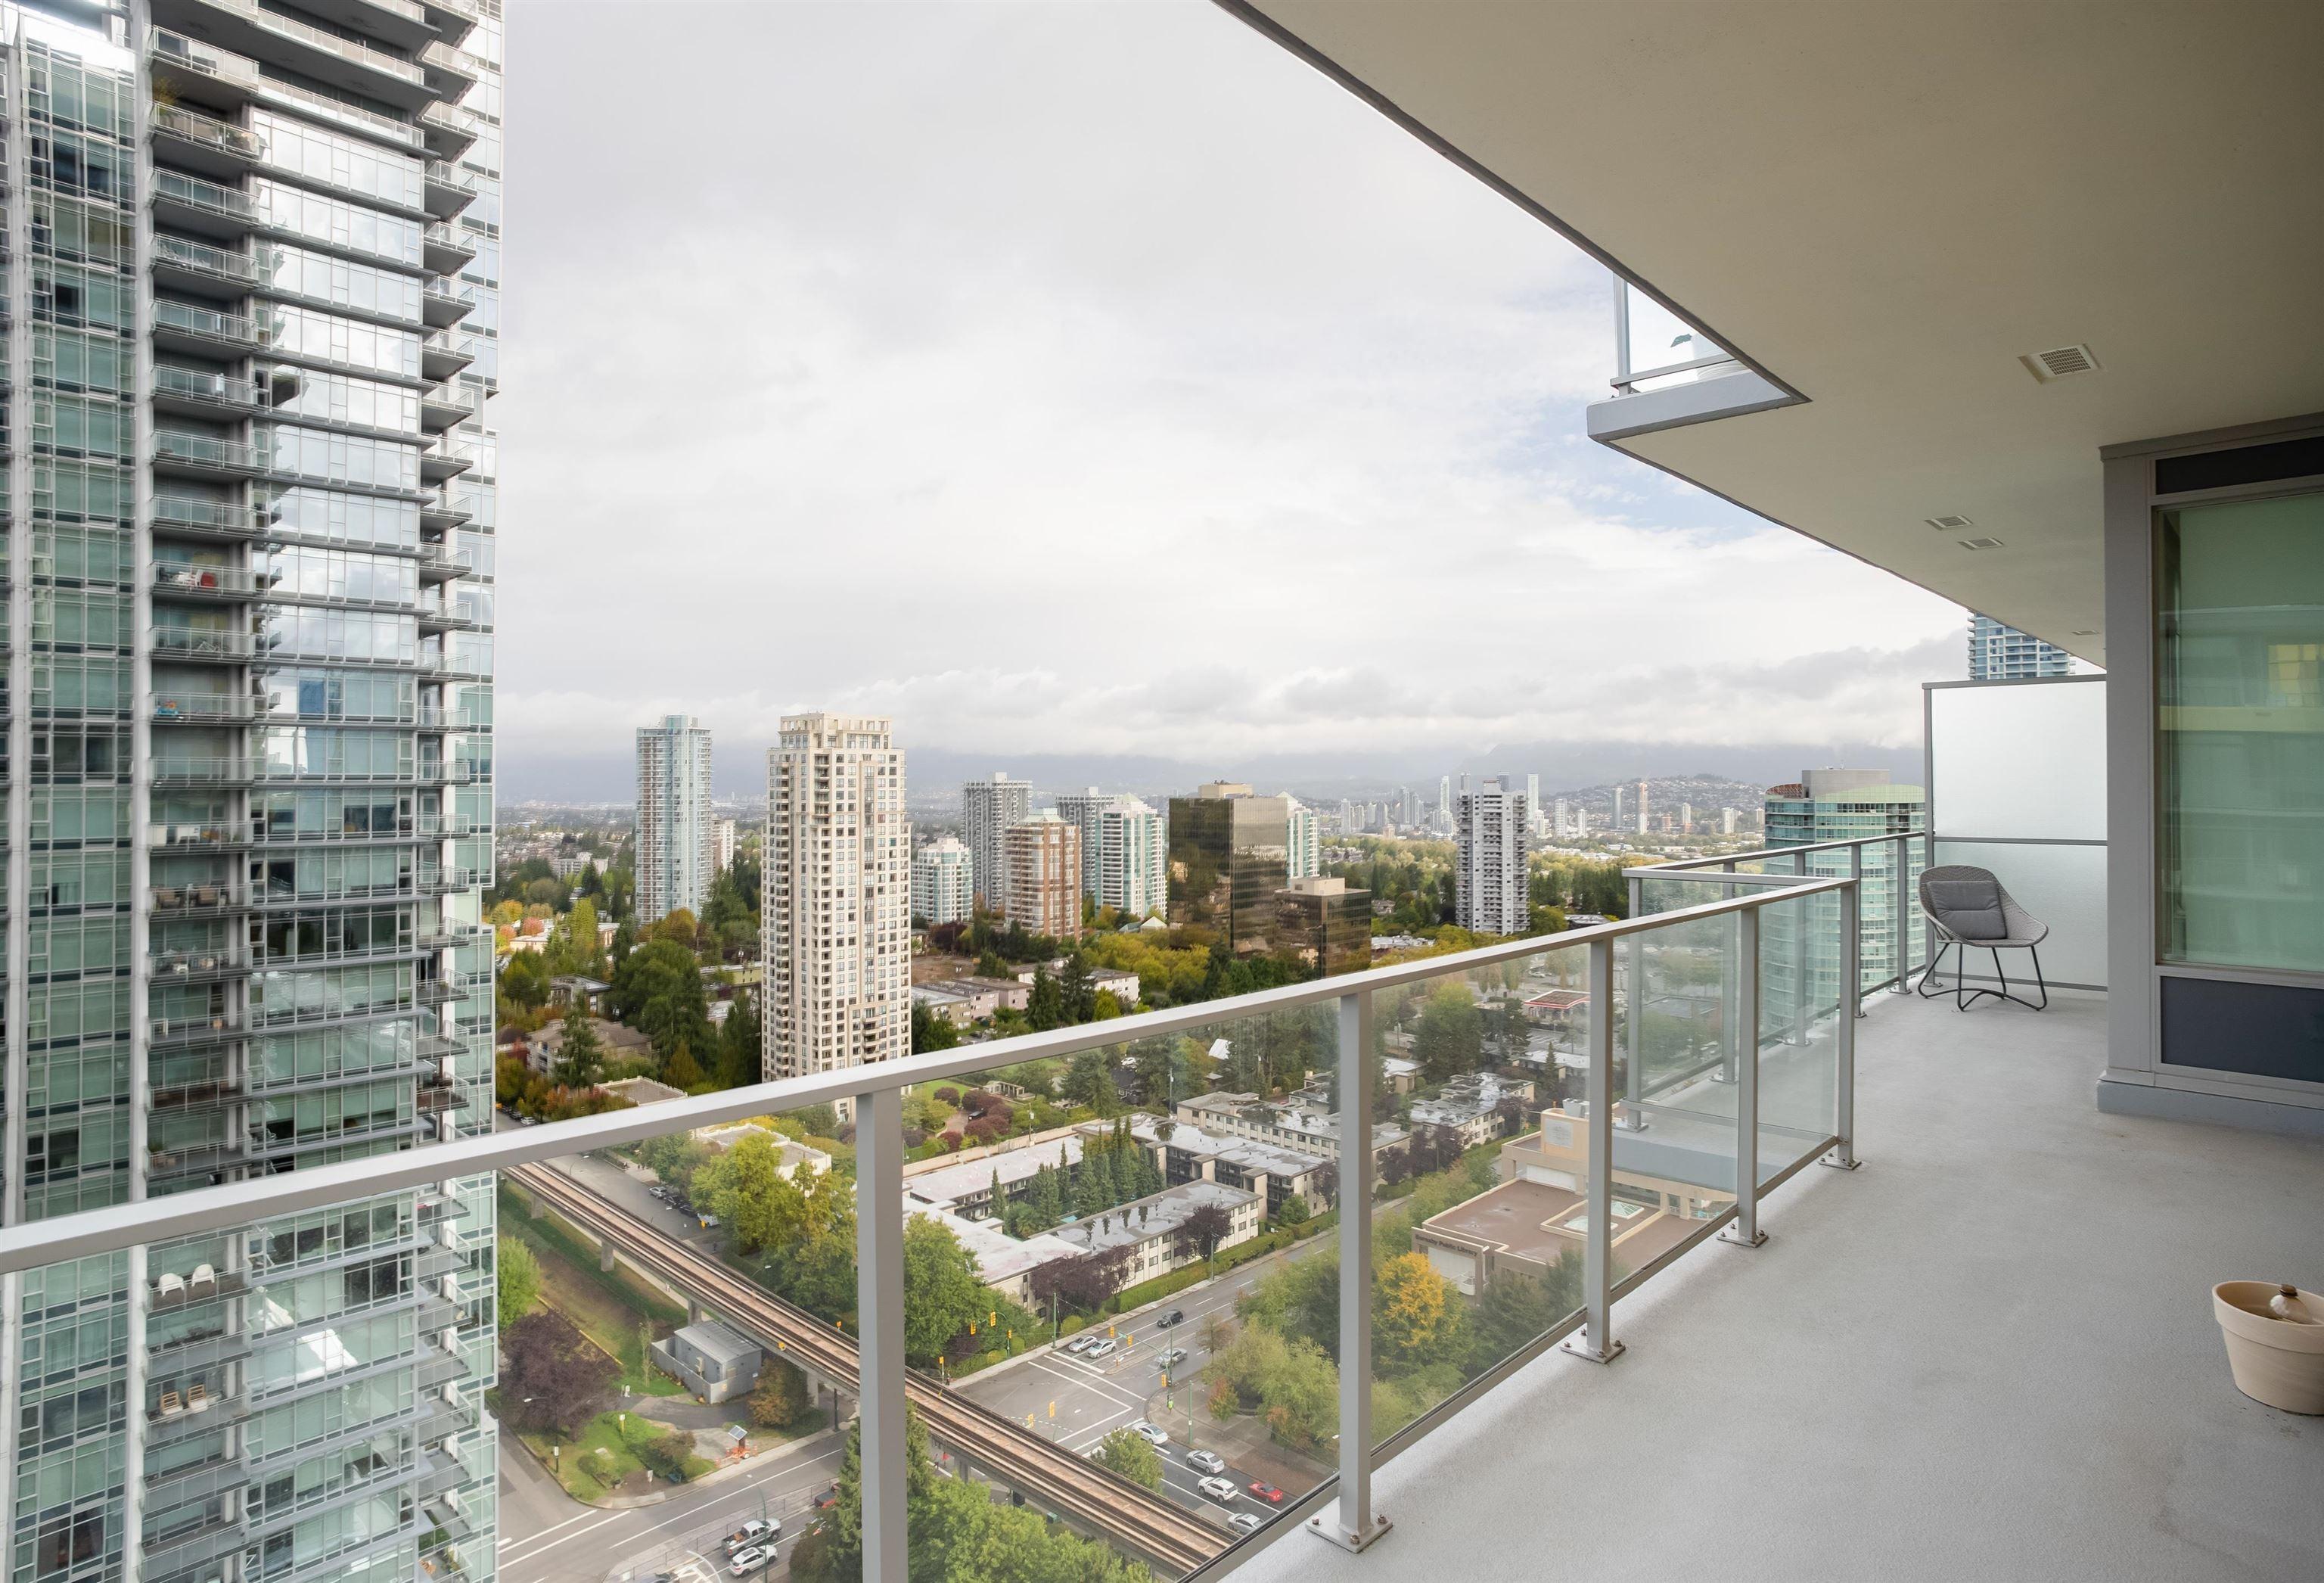 2206 6383 MCKAY AVENUE - Metrotown Apartment/Condo for sale, 2 Bedrooms (R2625647) - #23